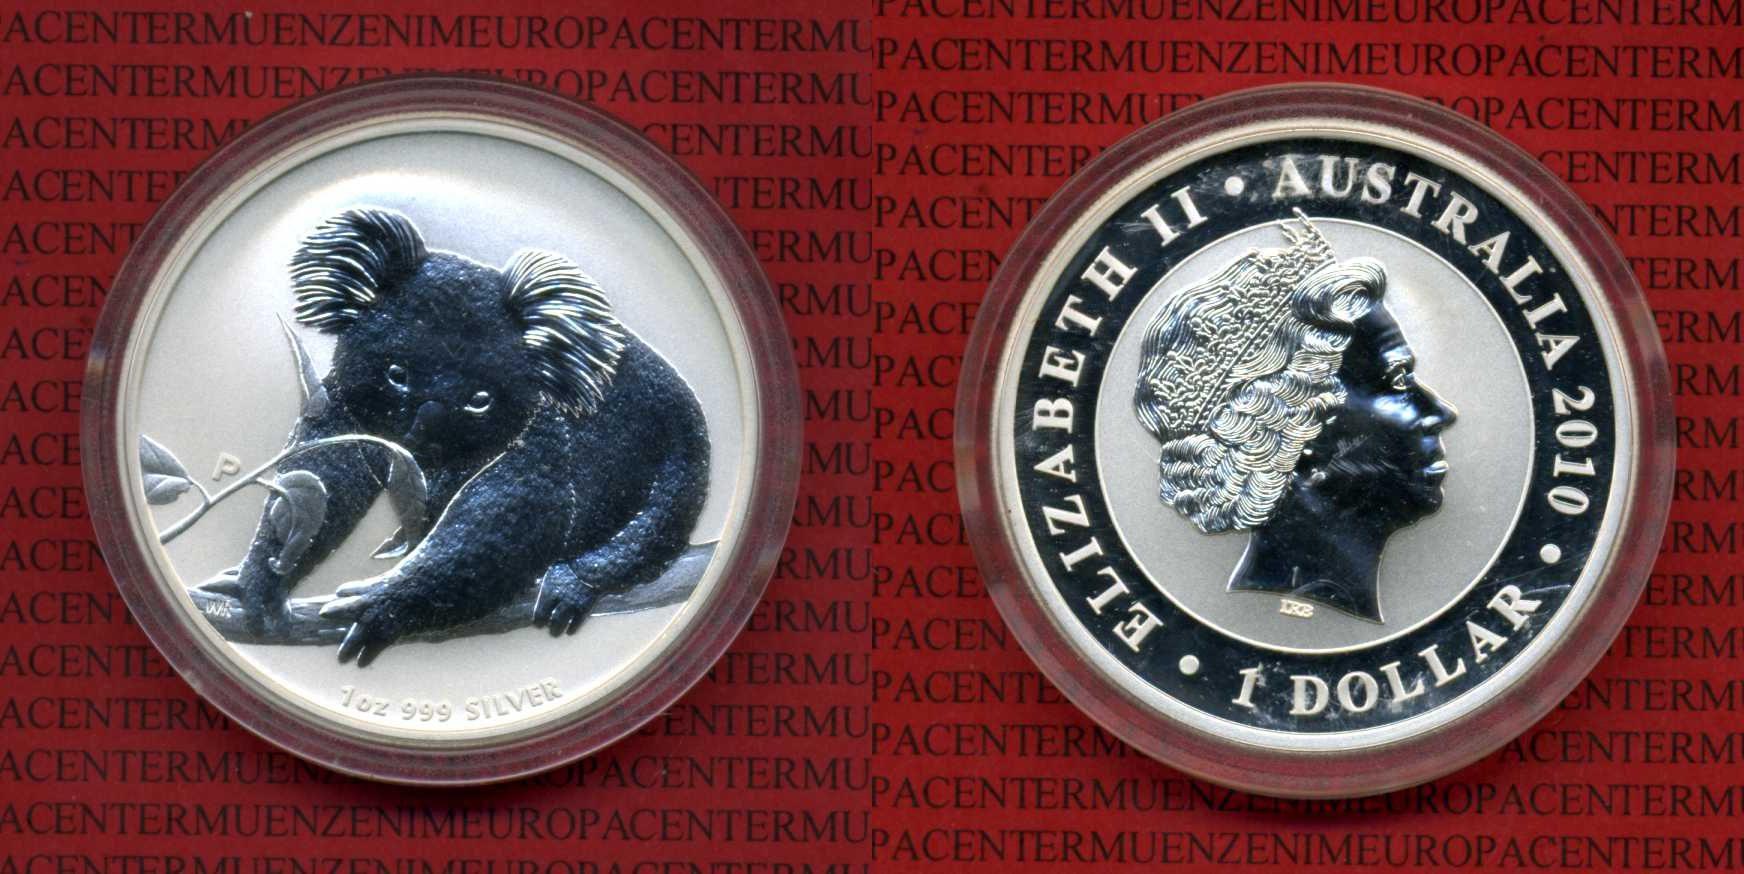 1 Dollar Koala Unze 2010 Australien Australia Australien 1 Dollar 1 Unze Silber 2010 Koala mit Kapsel Stempelglanz in Kapsel